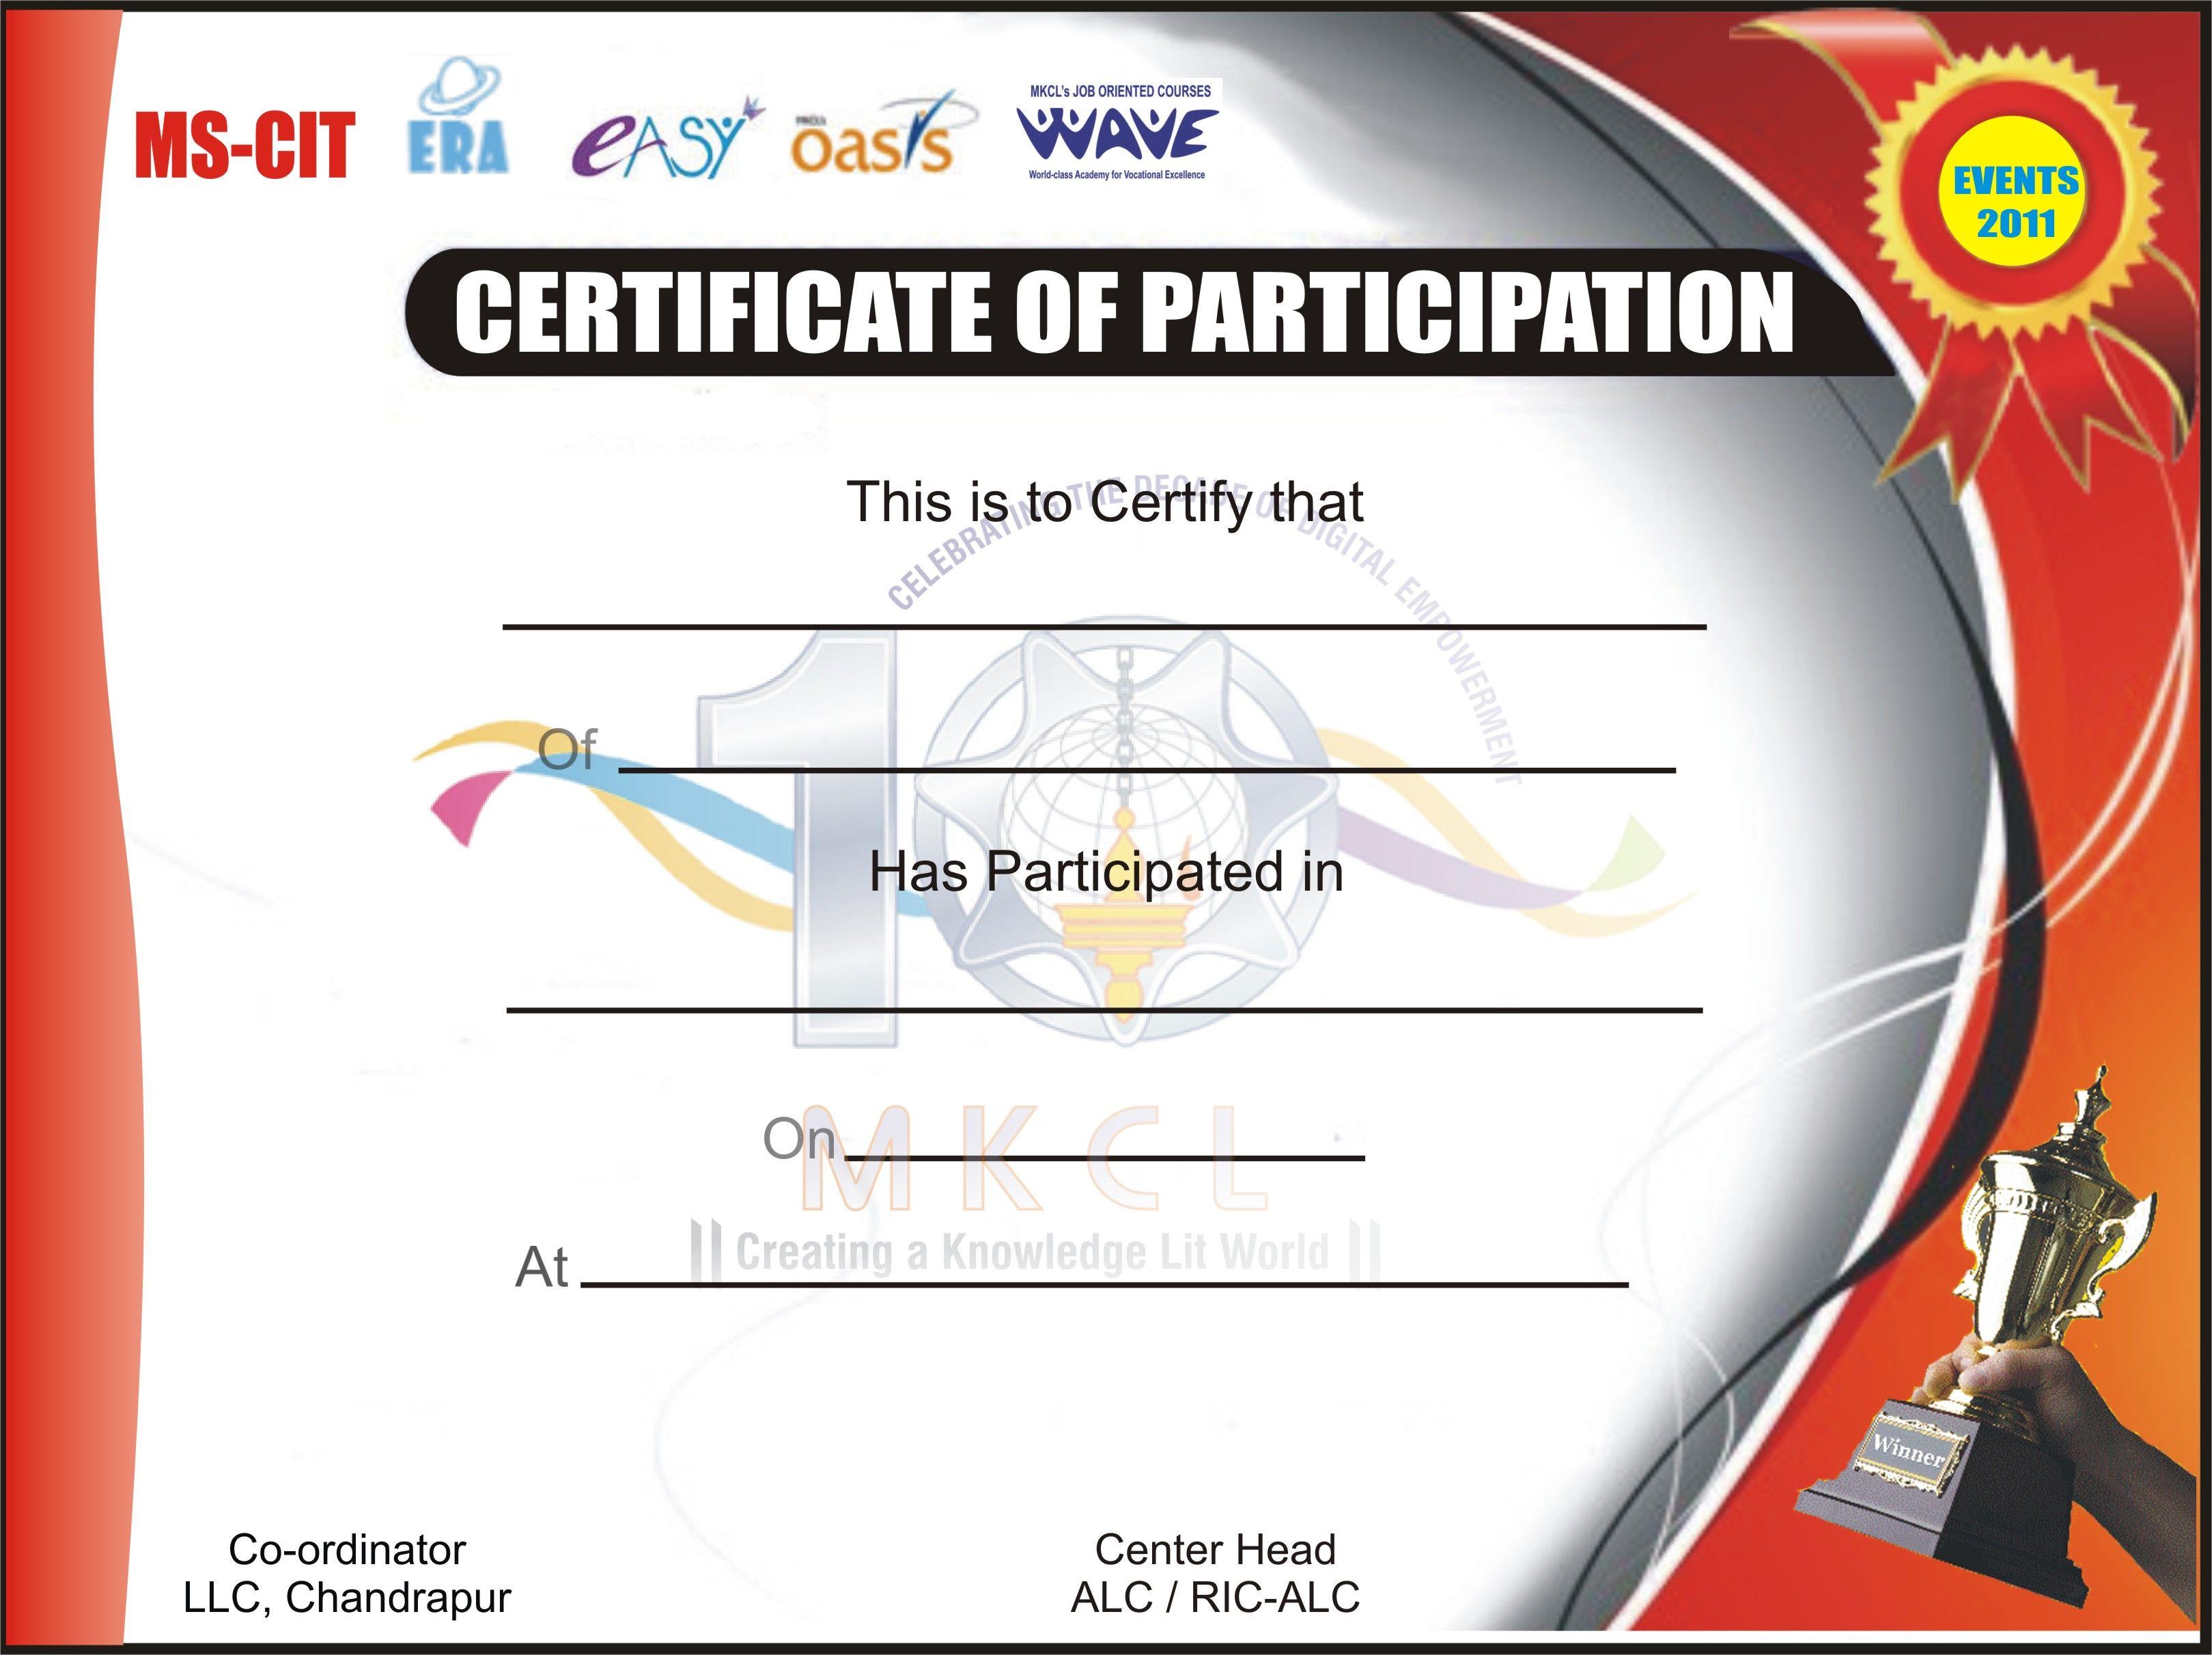 Certificate design templates free image collections templates certificate design templates free image collections templates certification for landscape design bathroom design 2017 2018 latest 1betcityfo Choice Image